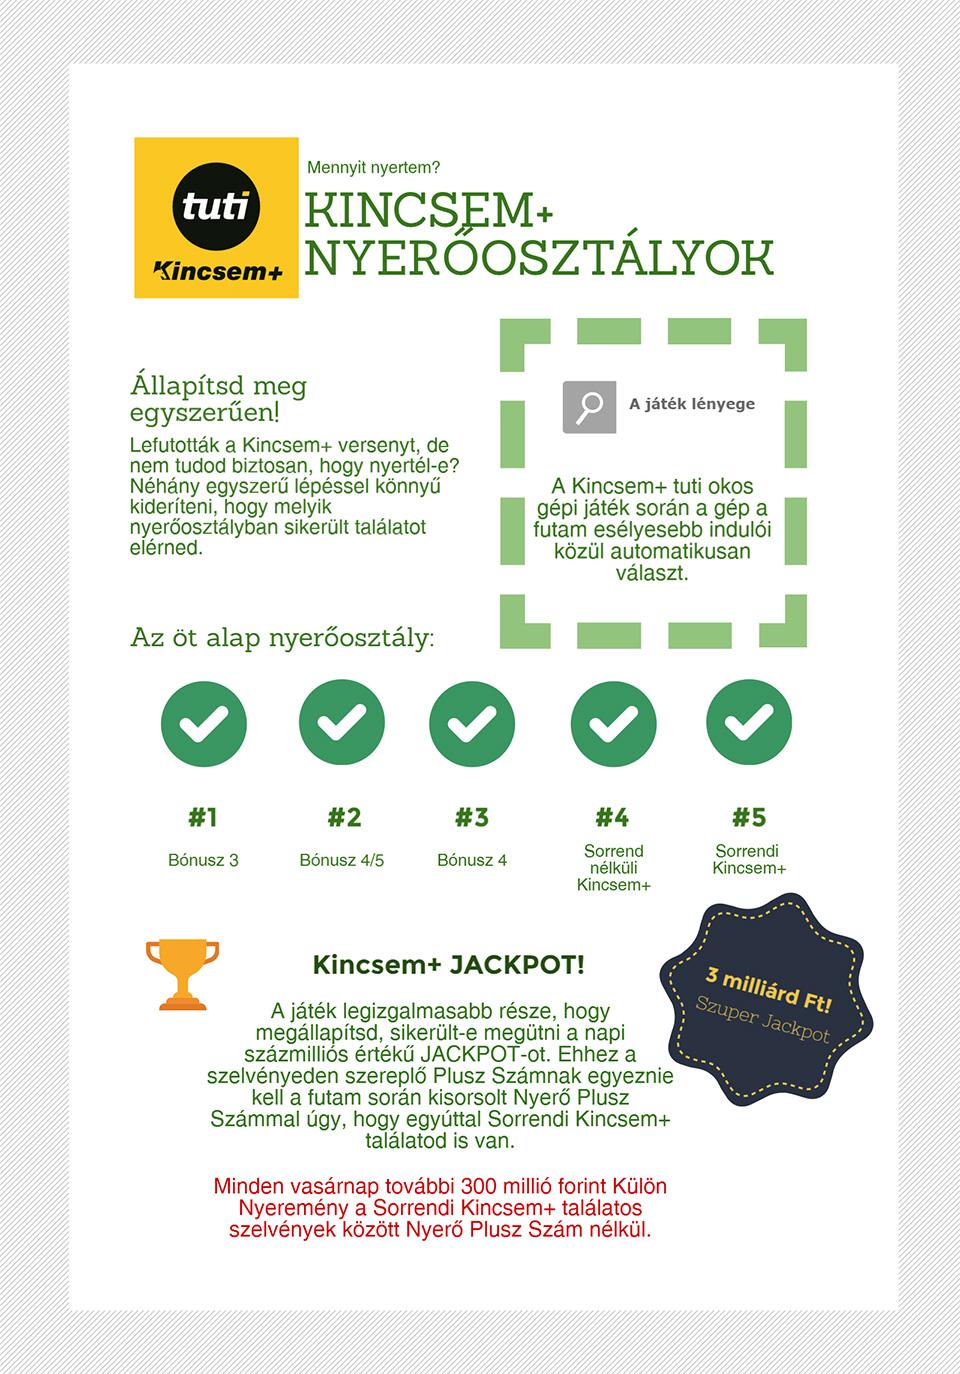 kincsem-5c-tuti_sarga_logo_jatekleiras3